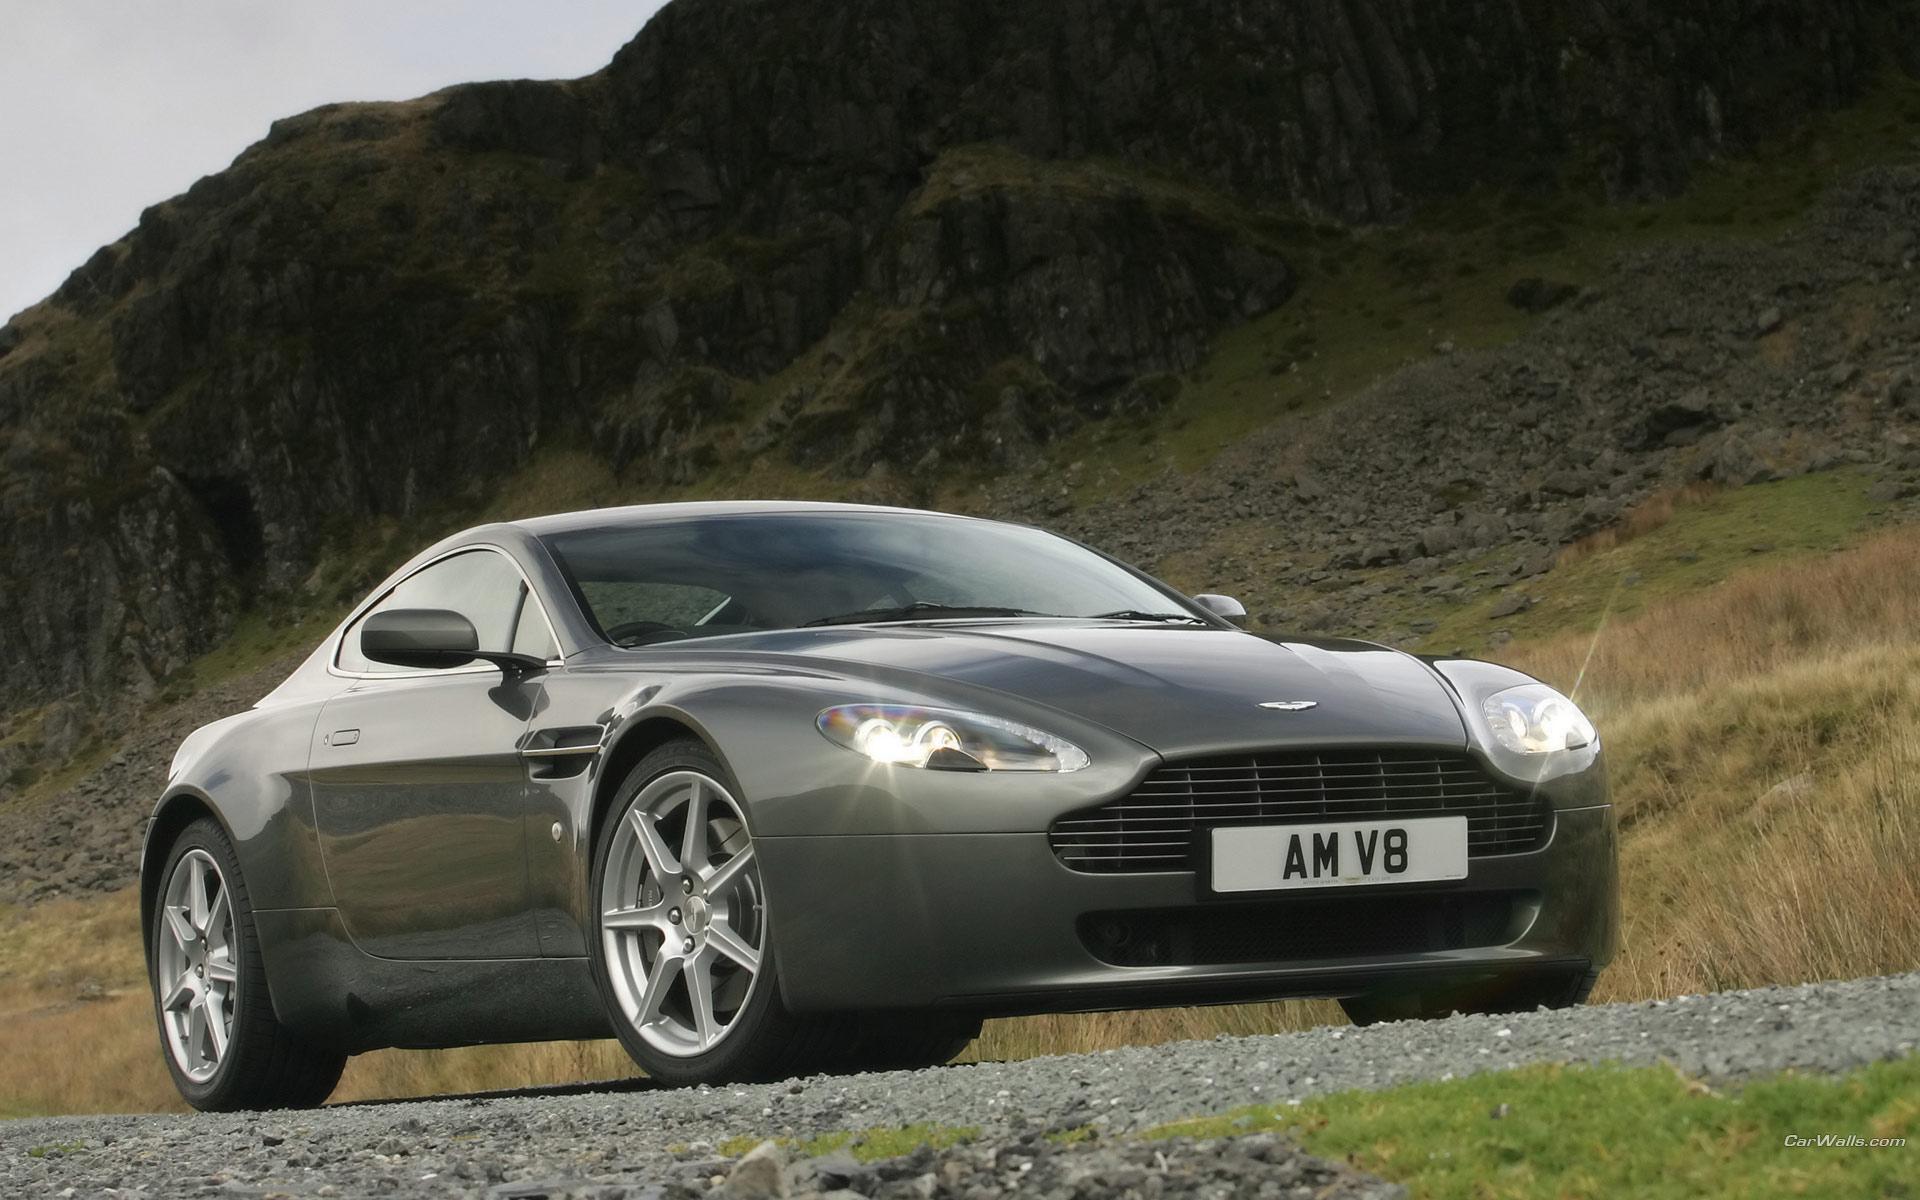 Aston Martin V8 Vantage Wallpapers Cool Cars Wallpaper 1920x1200